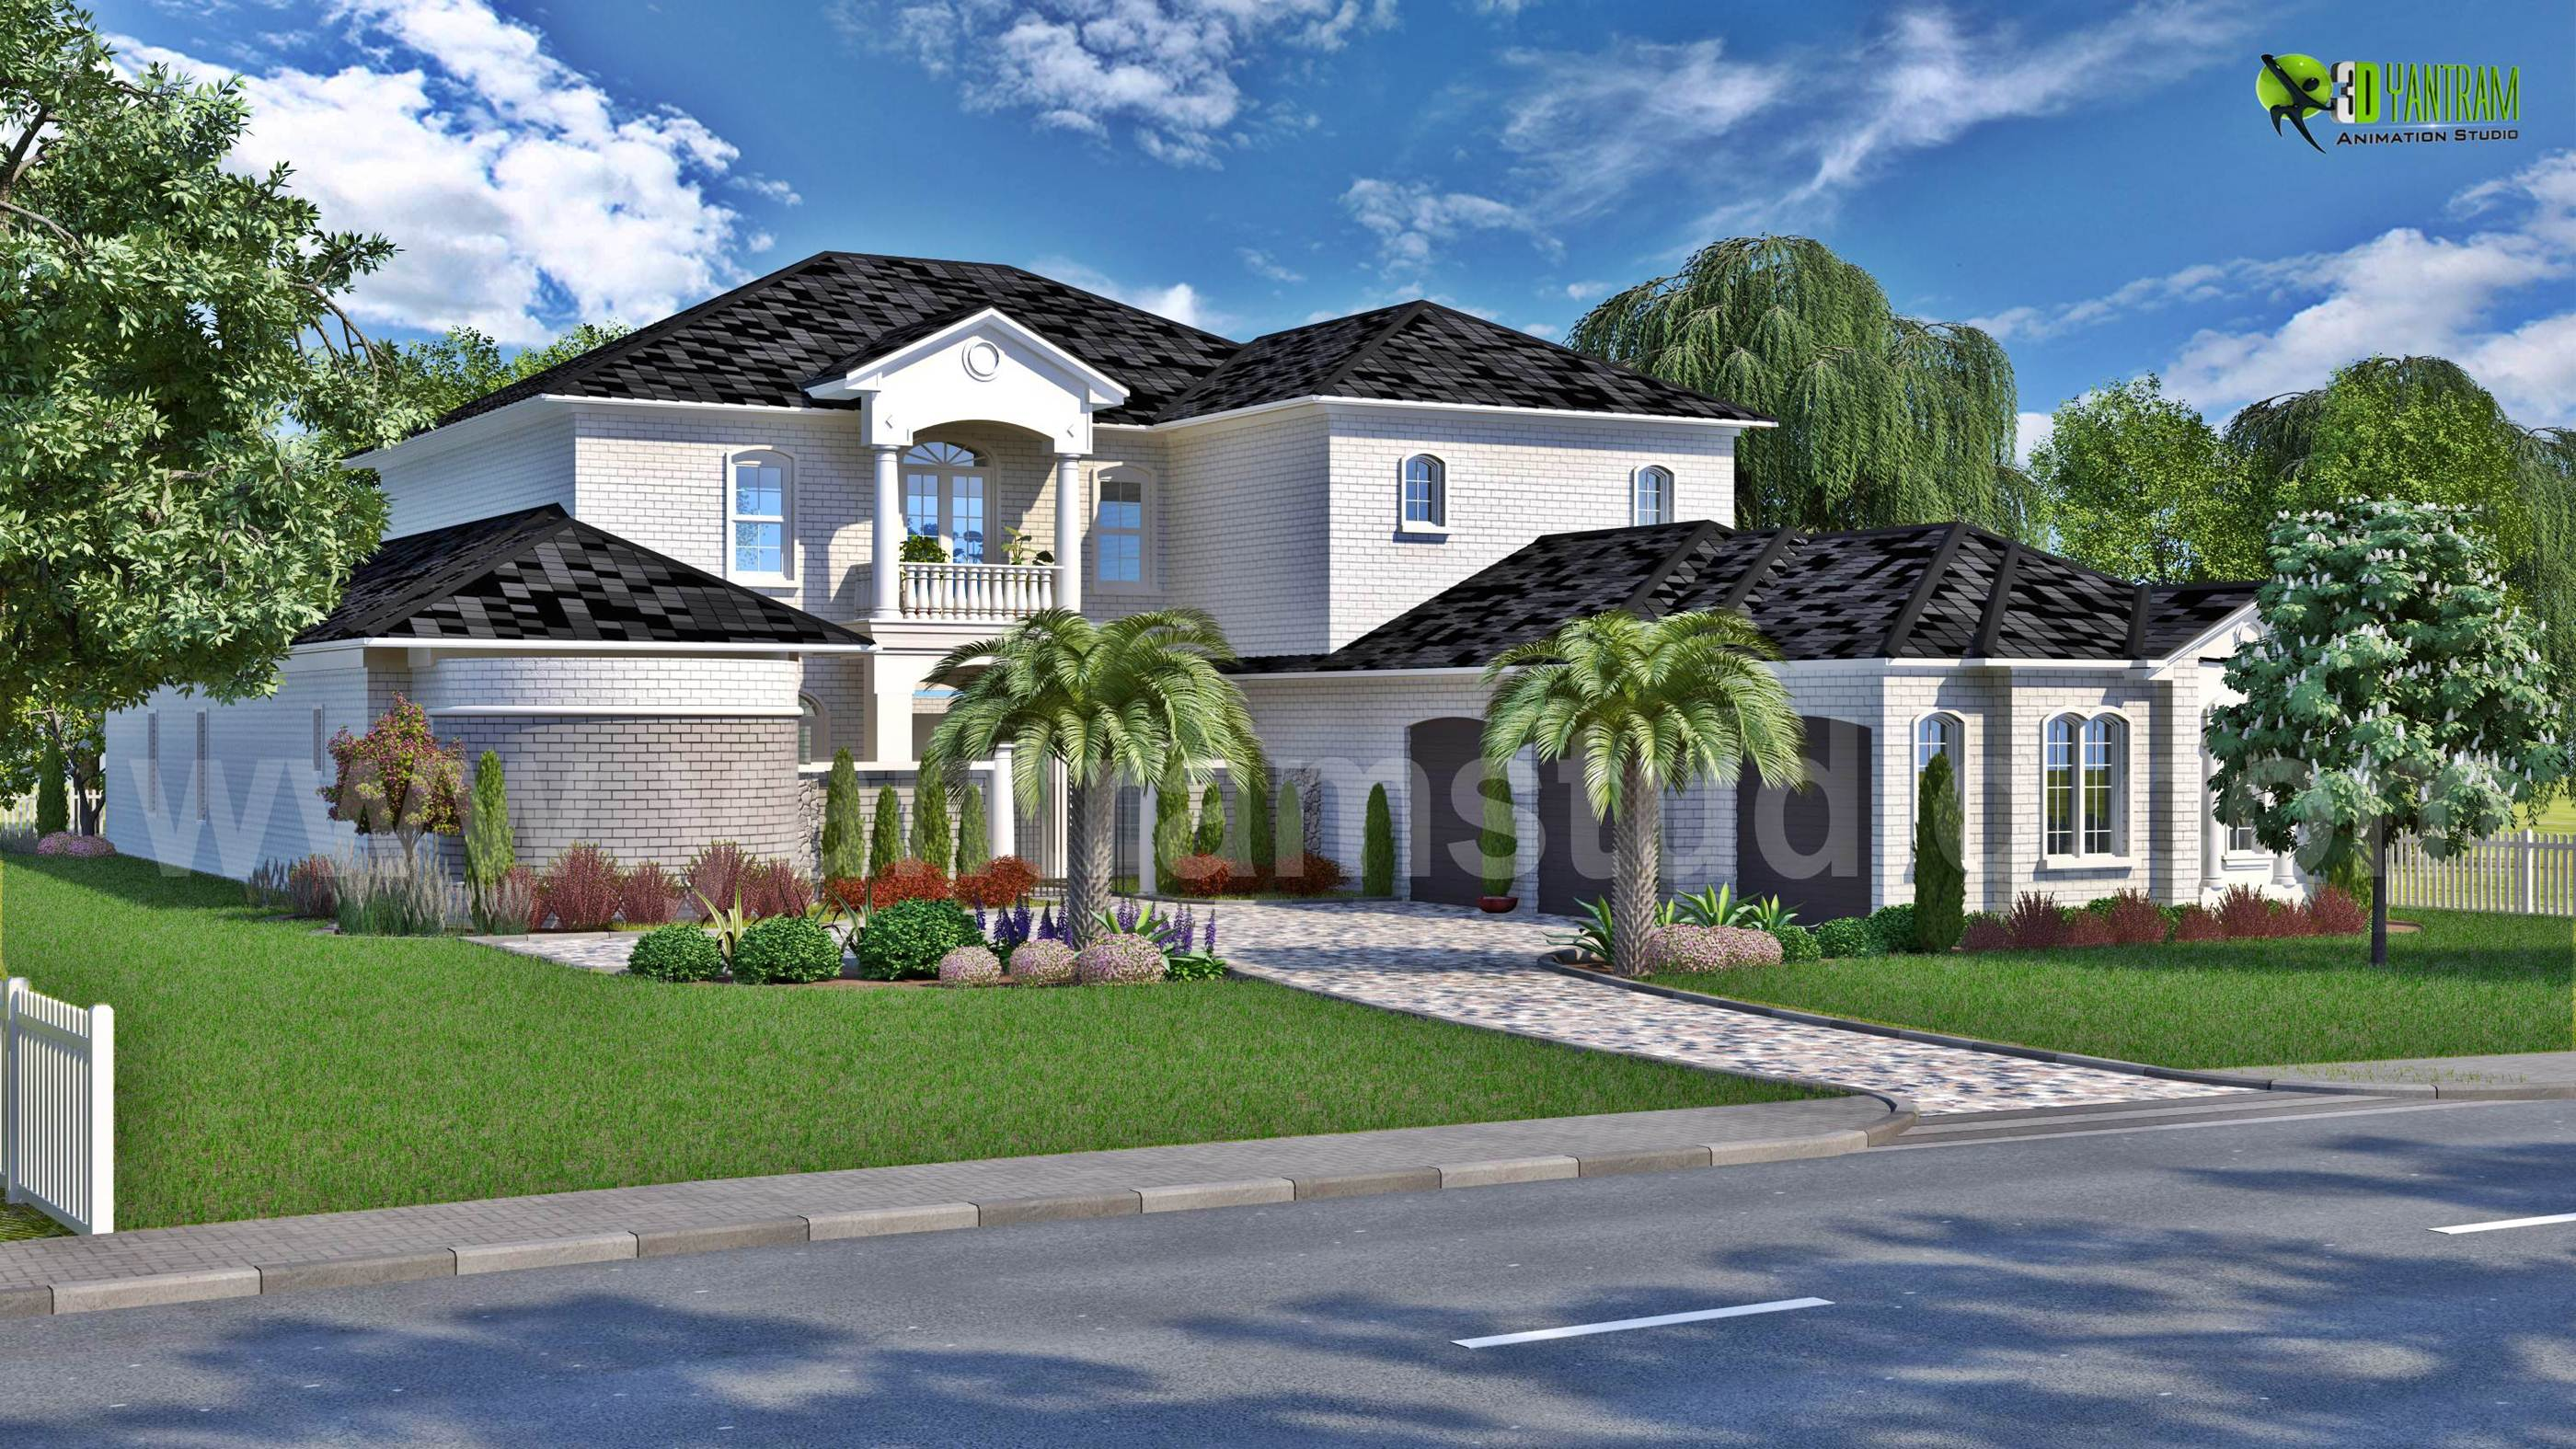 Modern bungalow 3d exterior design with landscape for Exterior design of bungalows